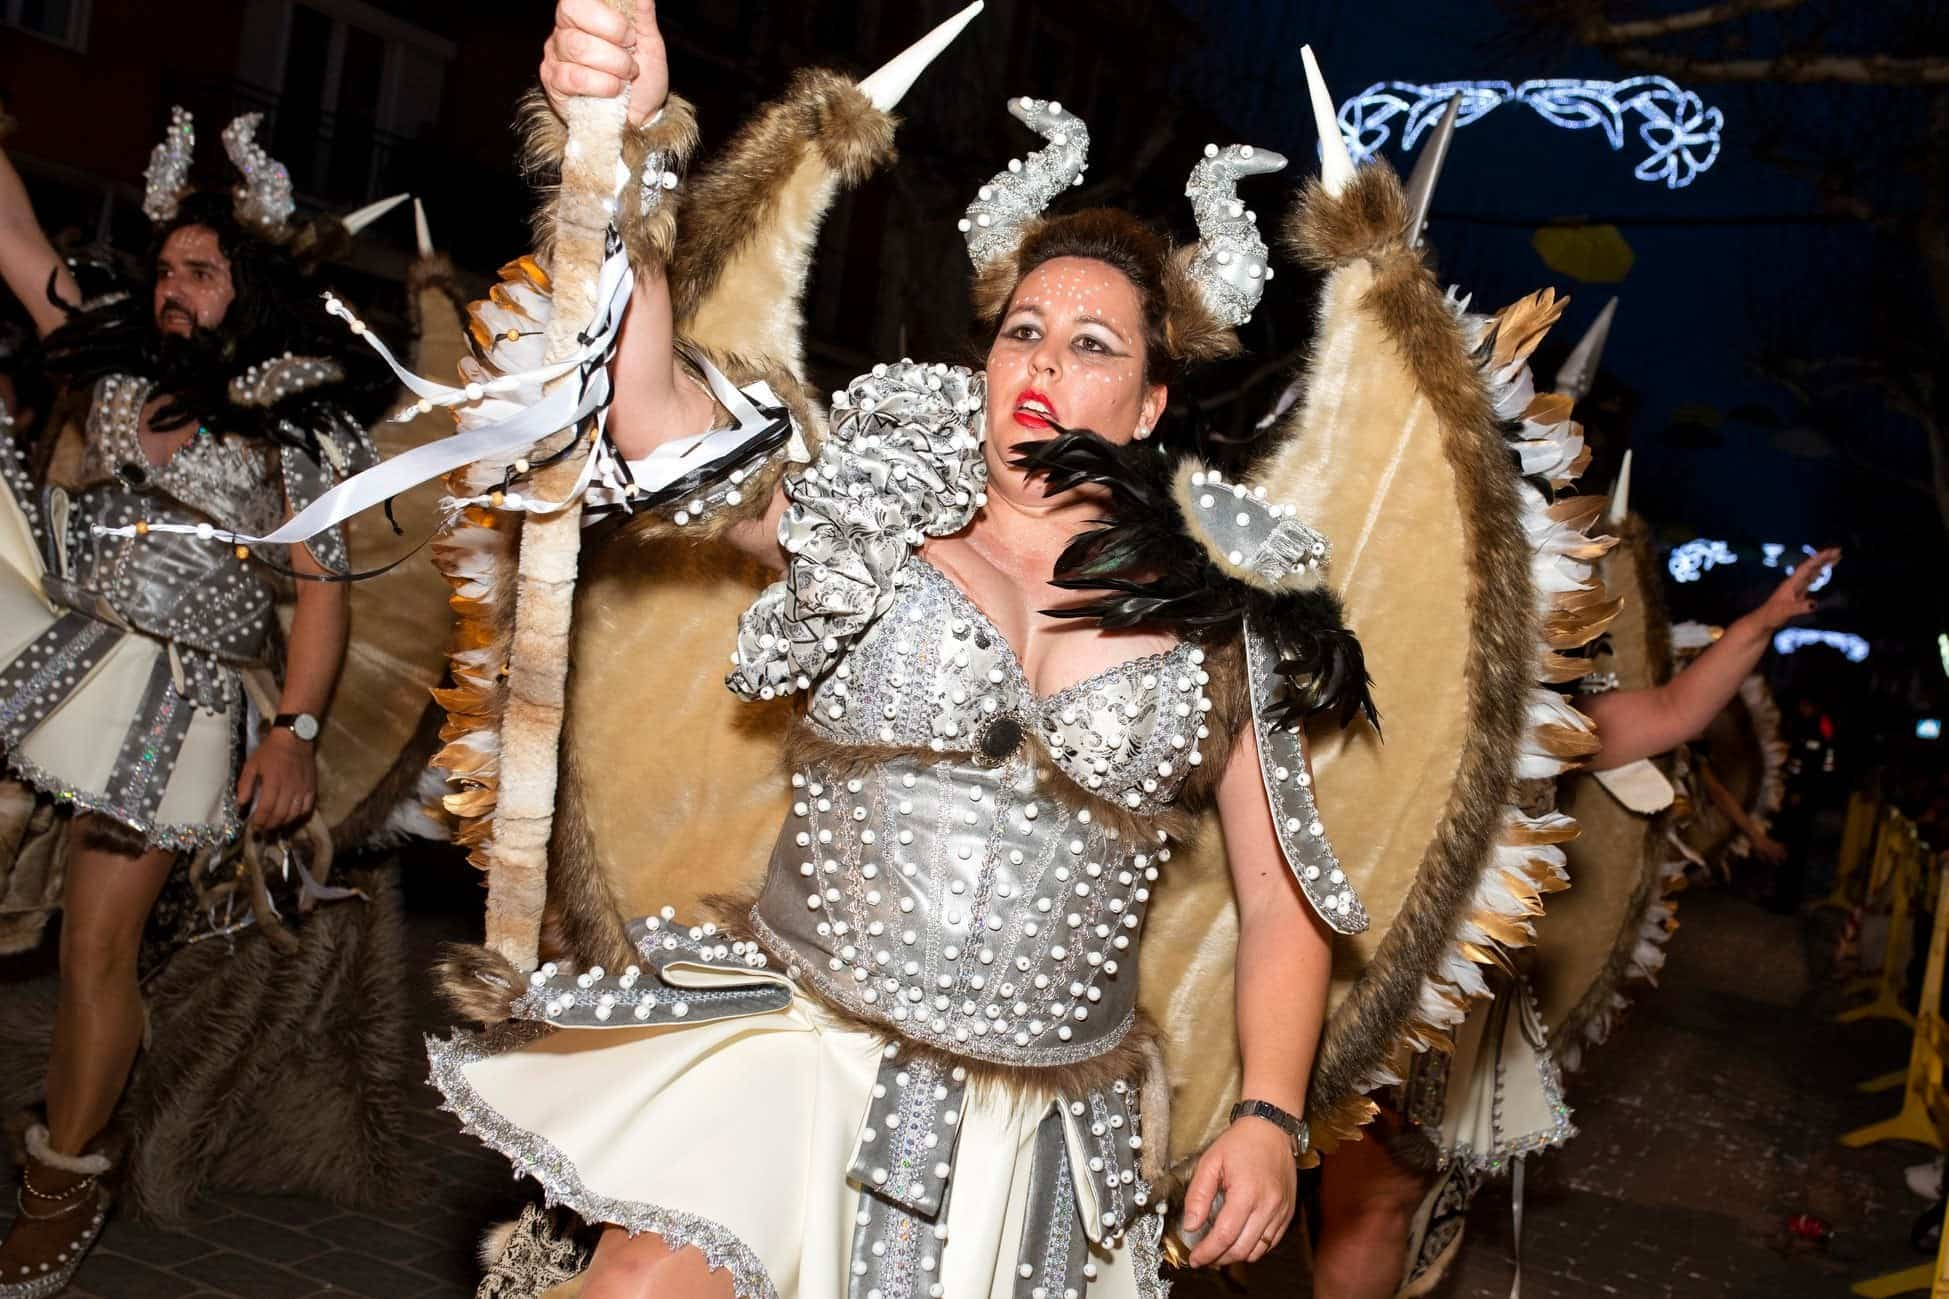 Carnaval de herencia 2020 ofertorio 19 - Selección de fotografías del Ofertorio del Carnaval de Herencia